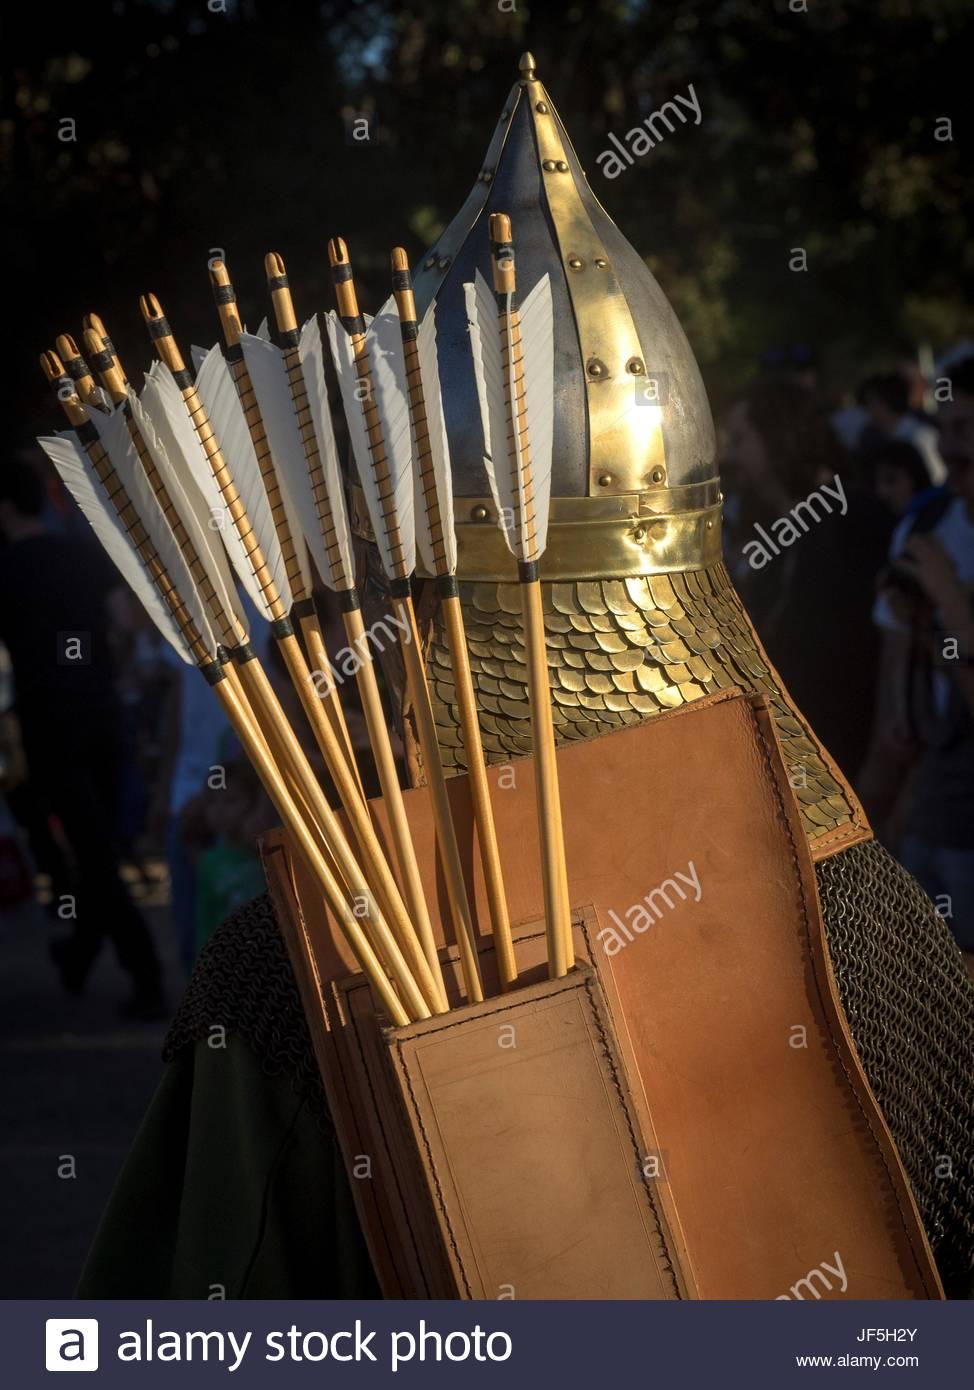 An actor wearing Roman costume at the Tarragona Roman Festival. - Stock Image